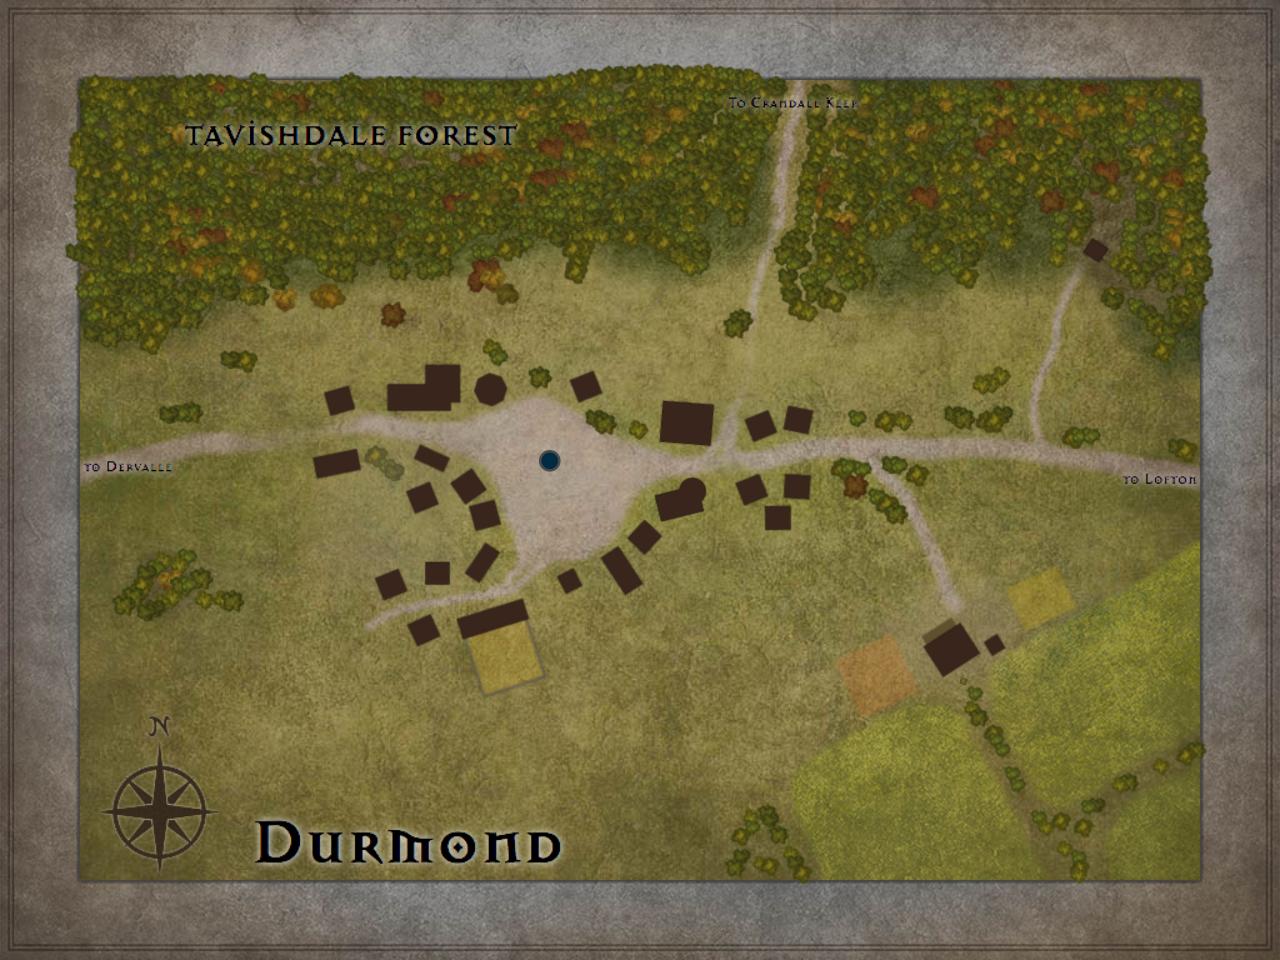 Durmond.png